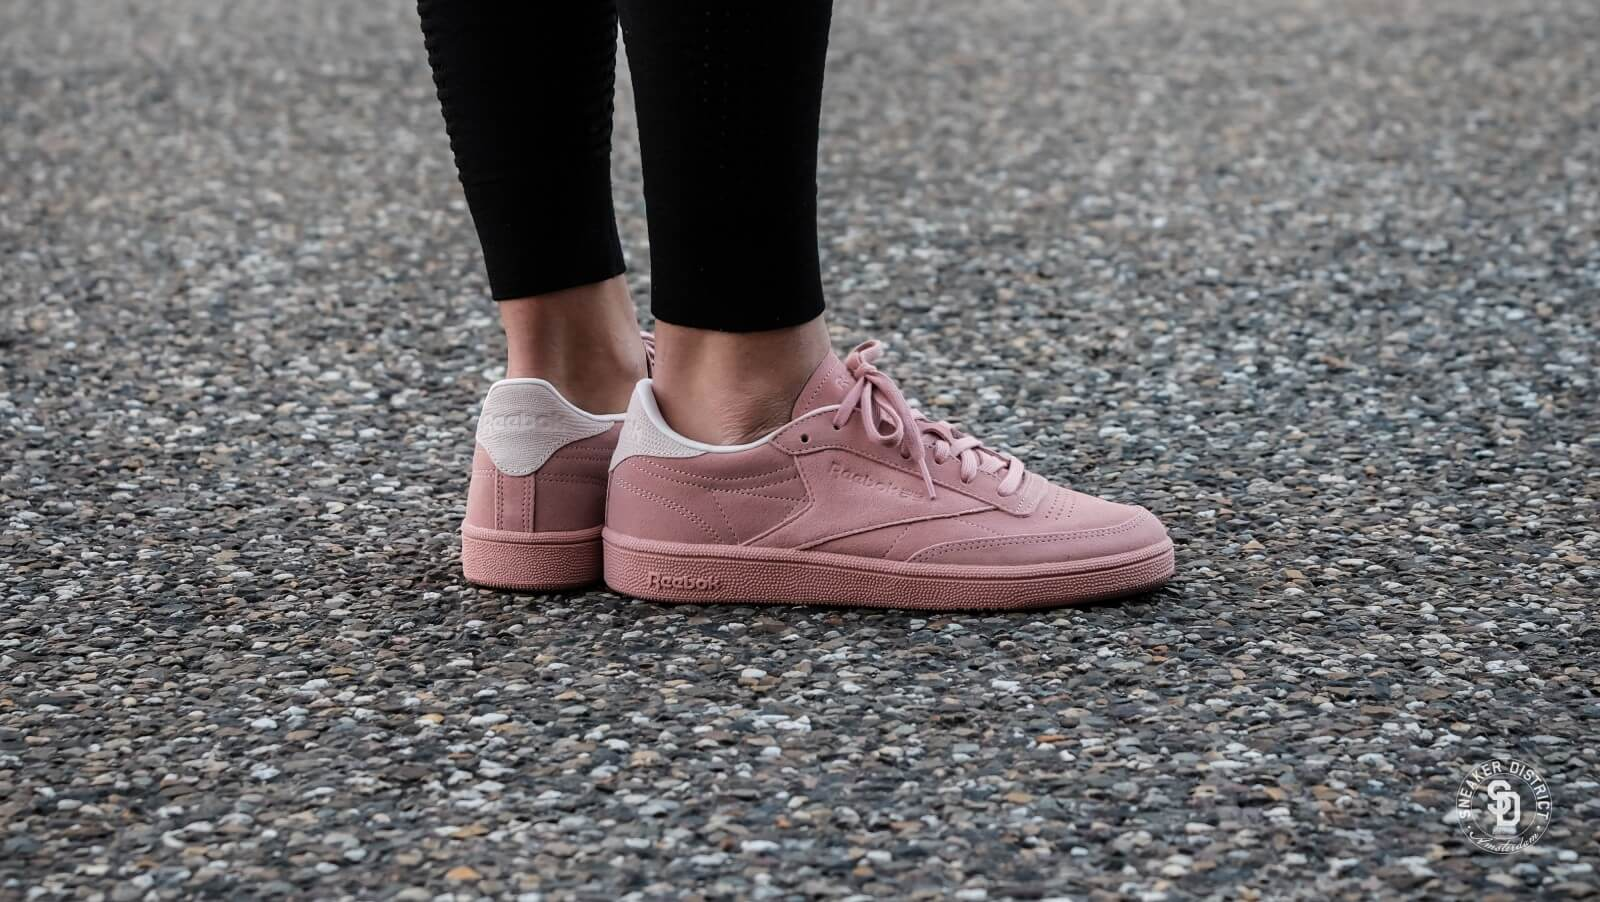 Club C 85 Nubuck Chalk Pink/Pale Pink